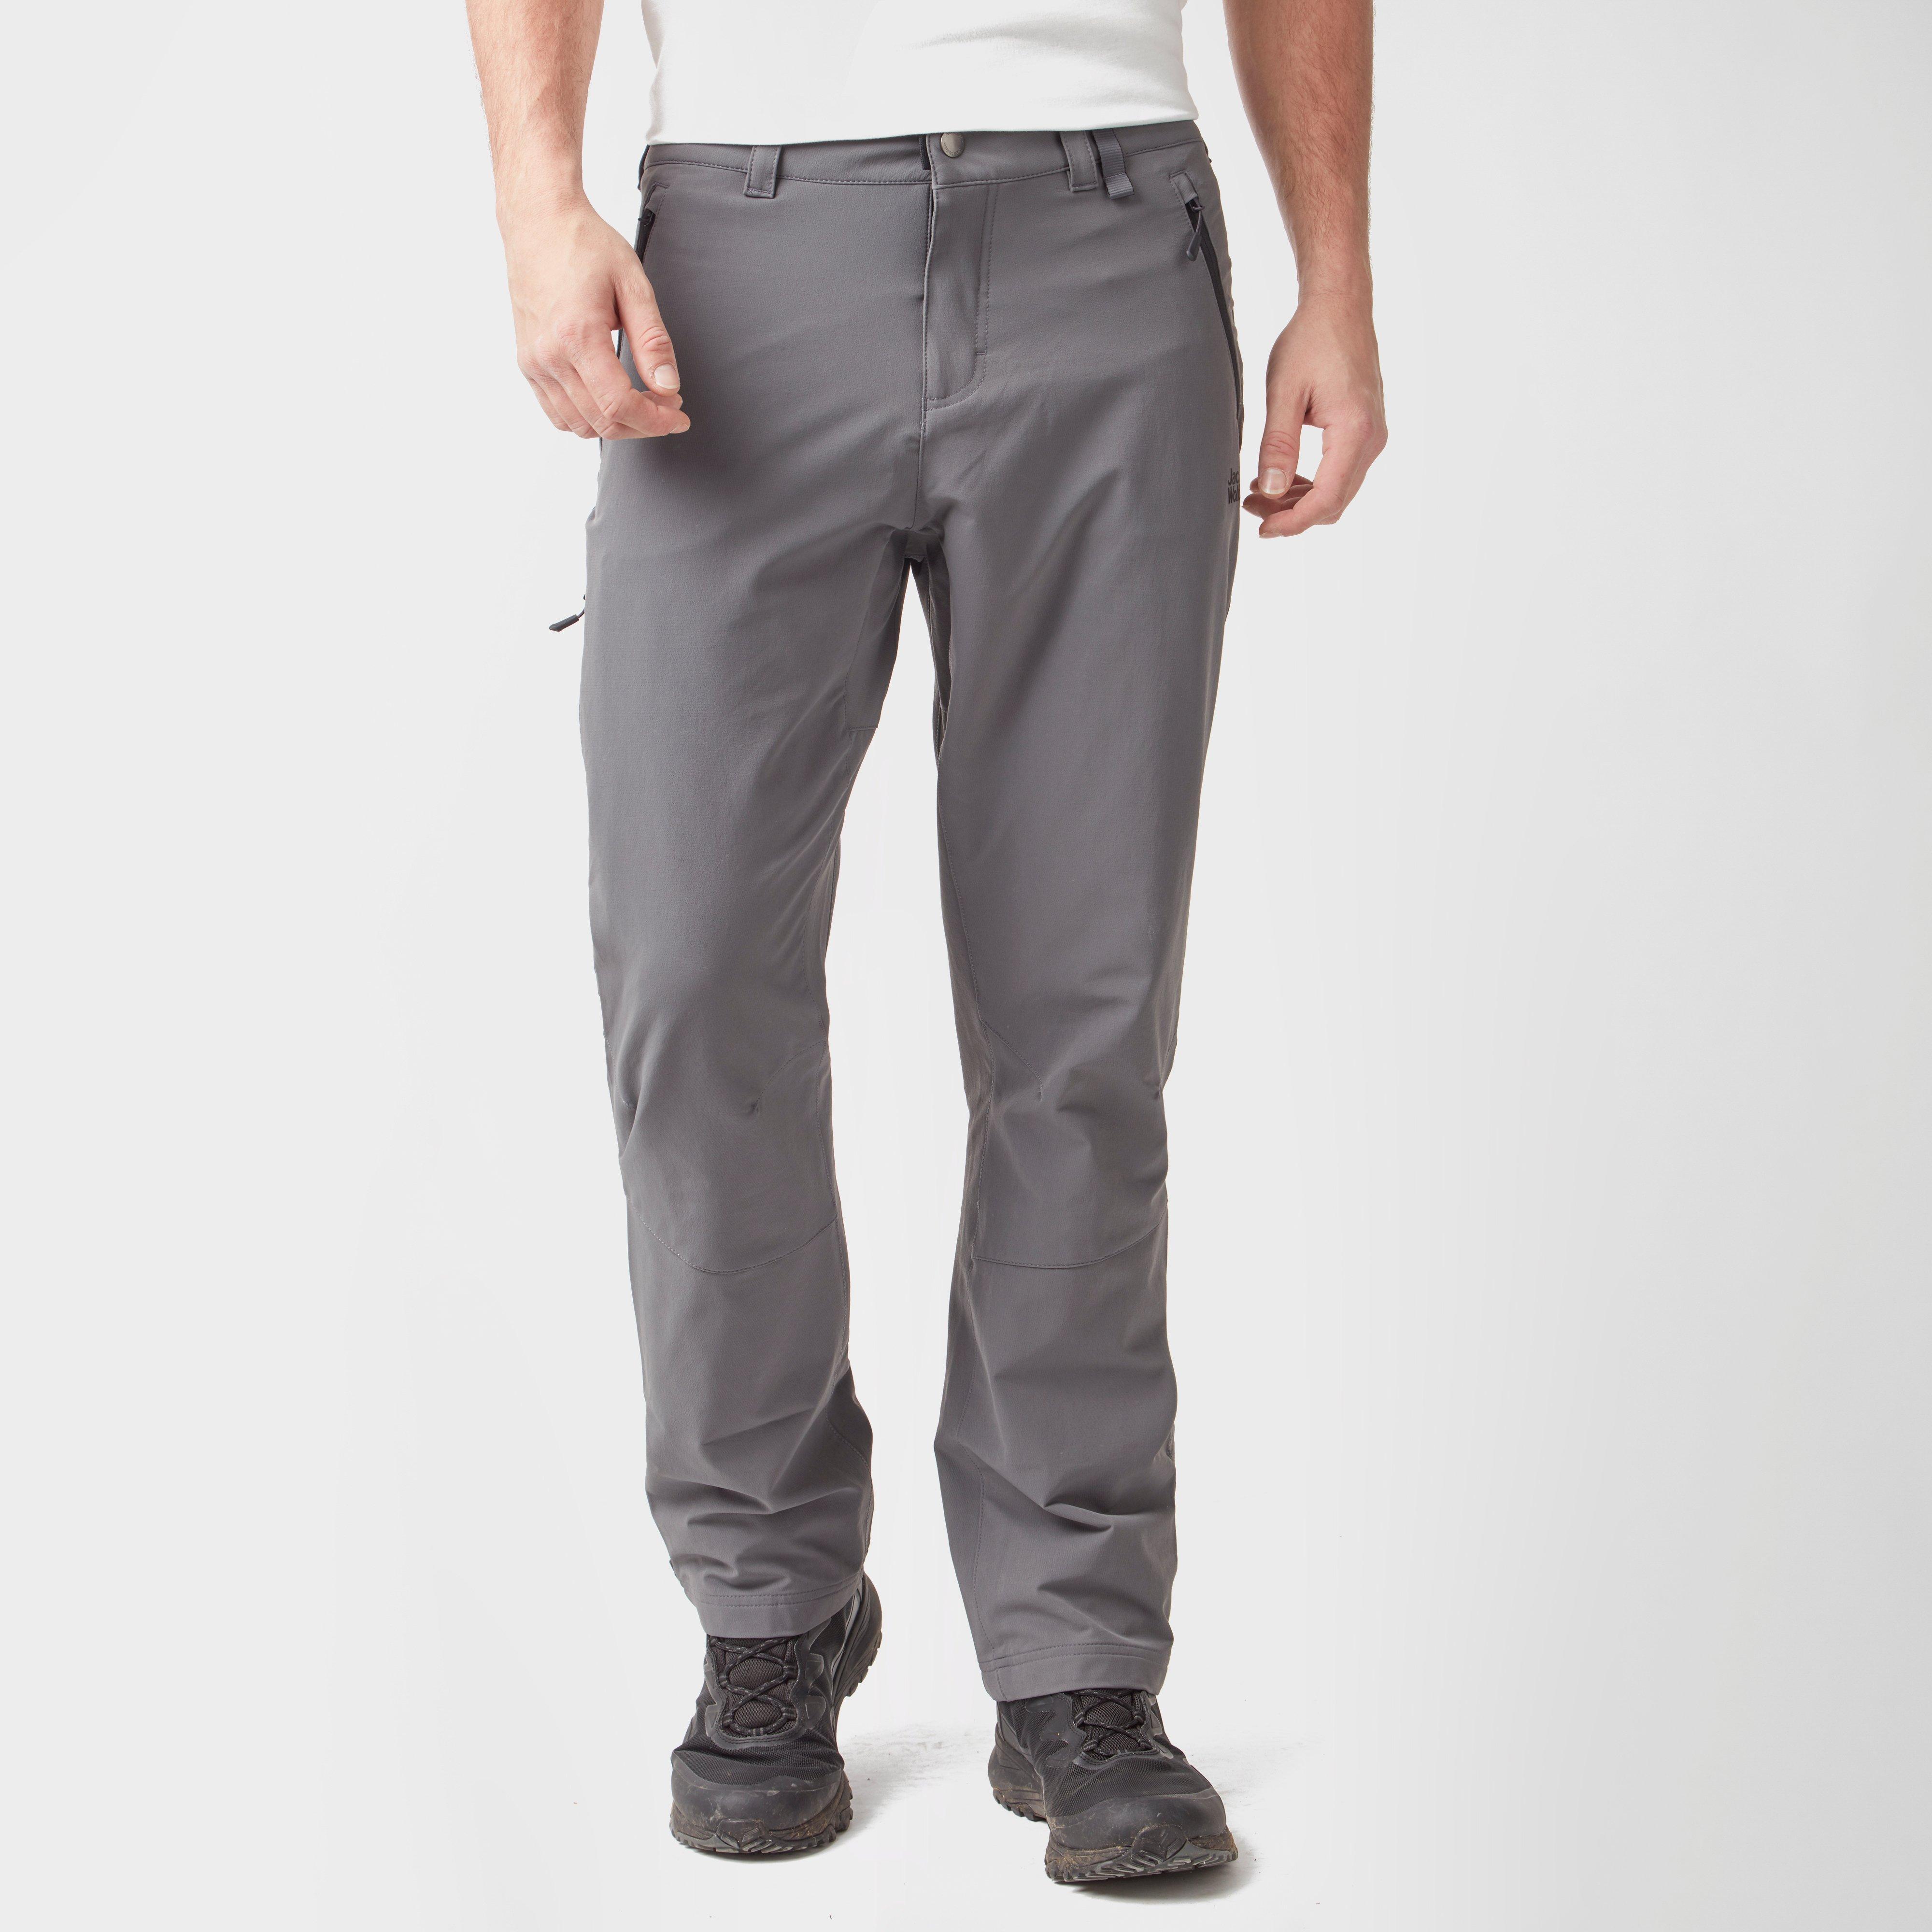 Jack Wolfskin Jack Wolfskin Mens Activate XT Trousers - Grey, Grey